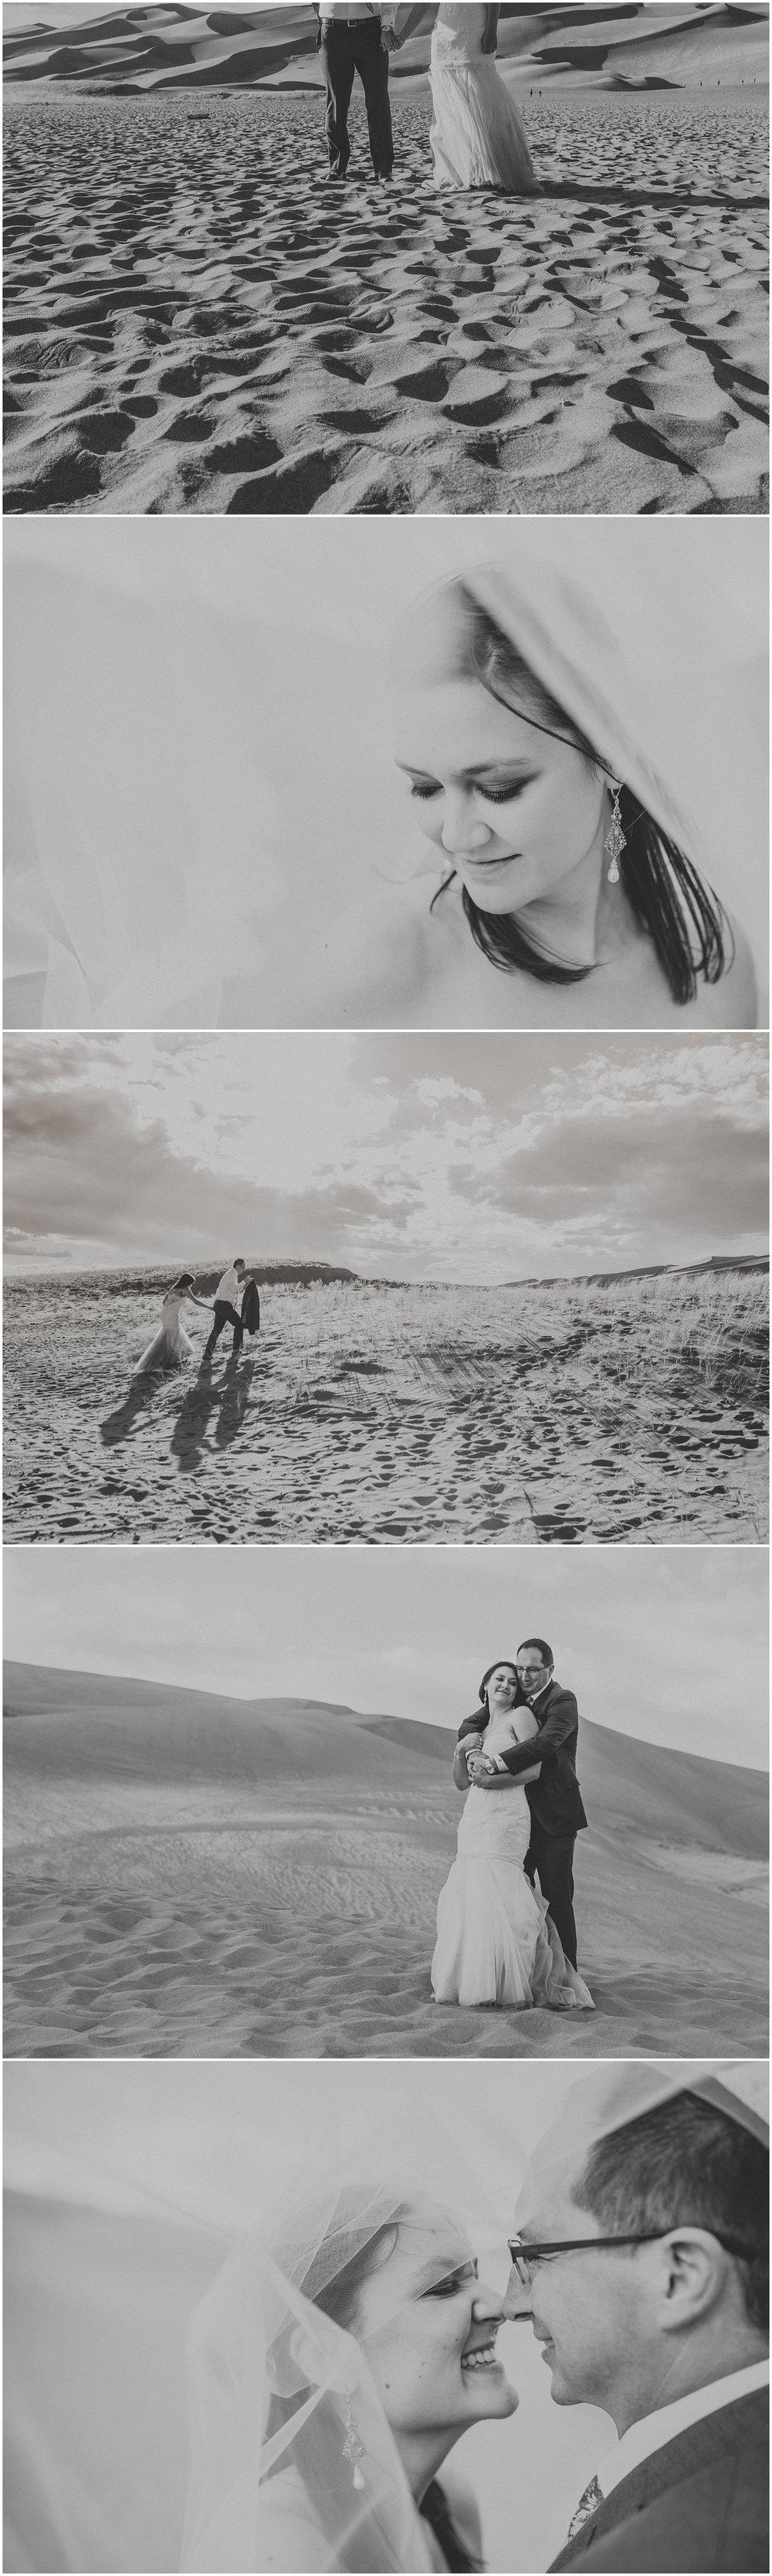 sand-dunes-national-park-wedding-photos_0013.jpg